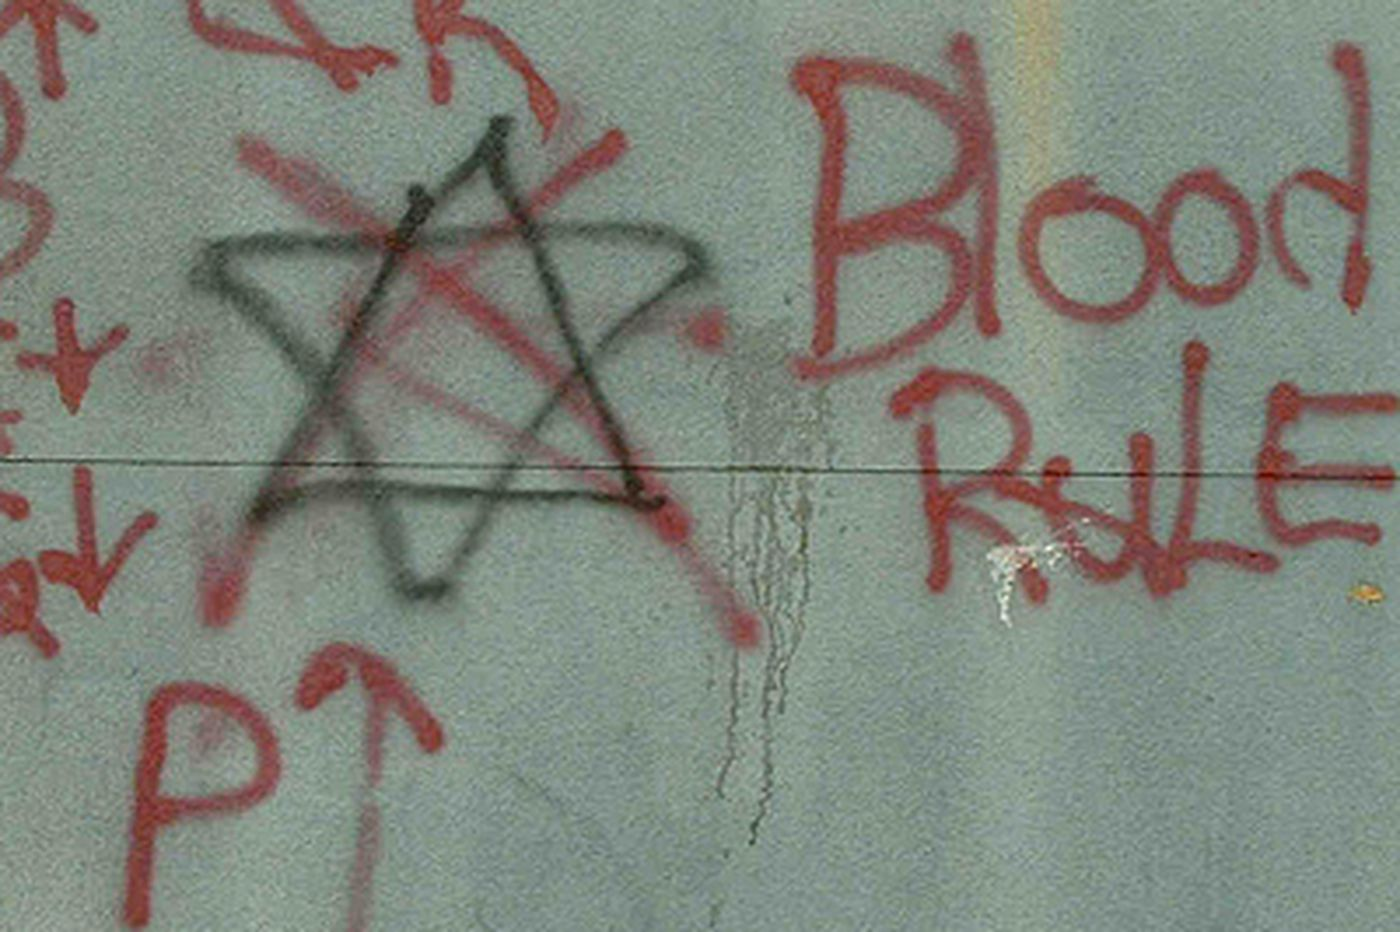 Graffiti Tell A Tale Of Gang Activity